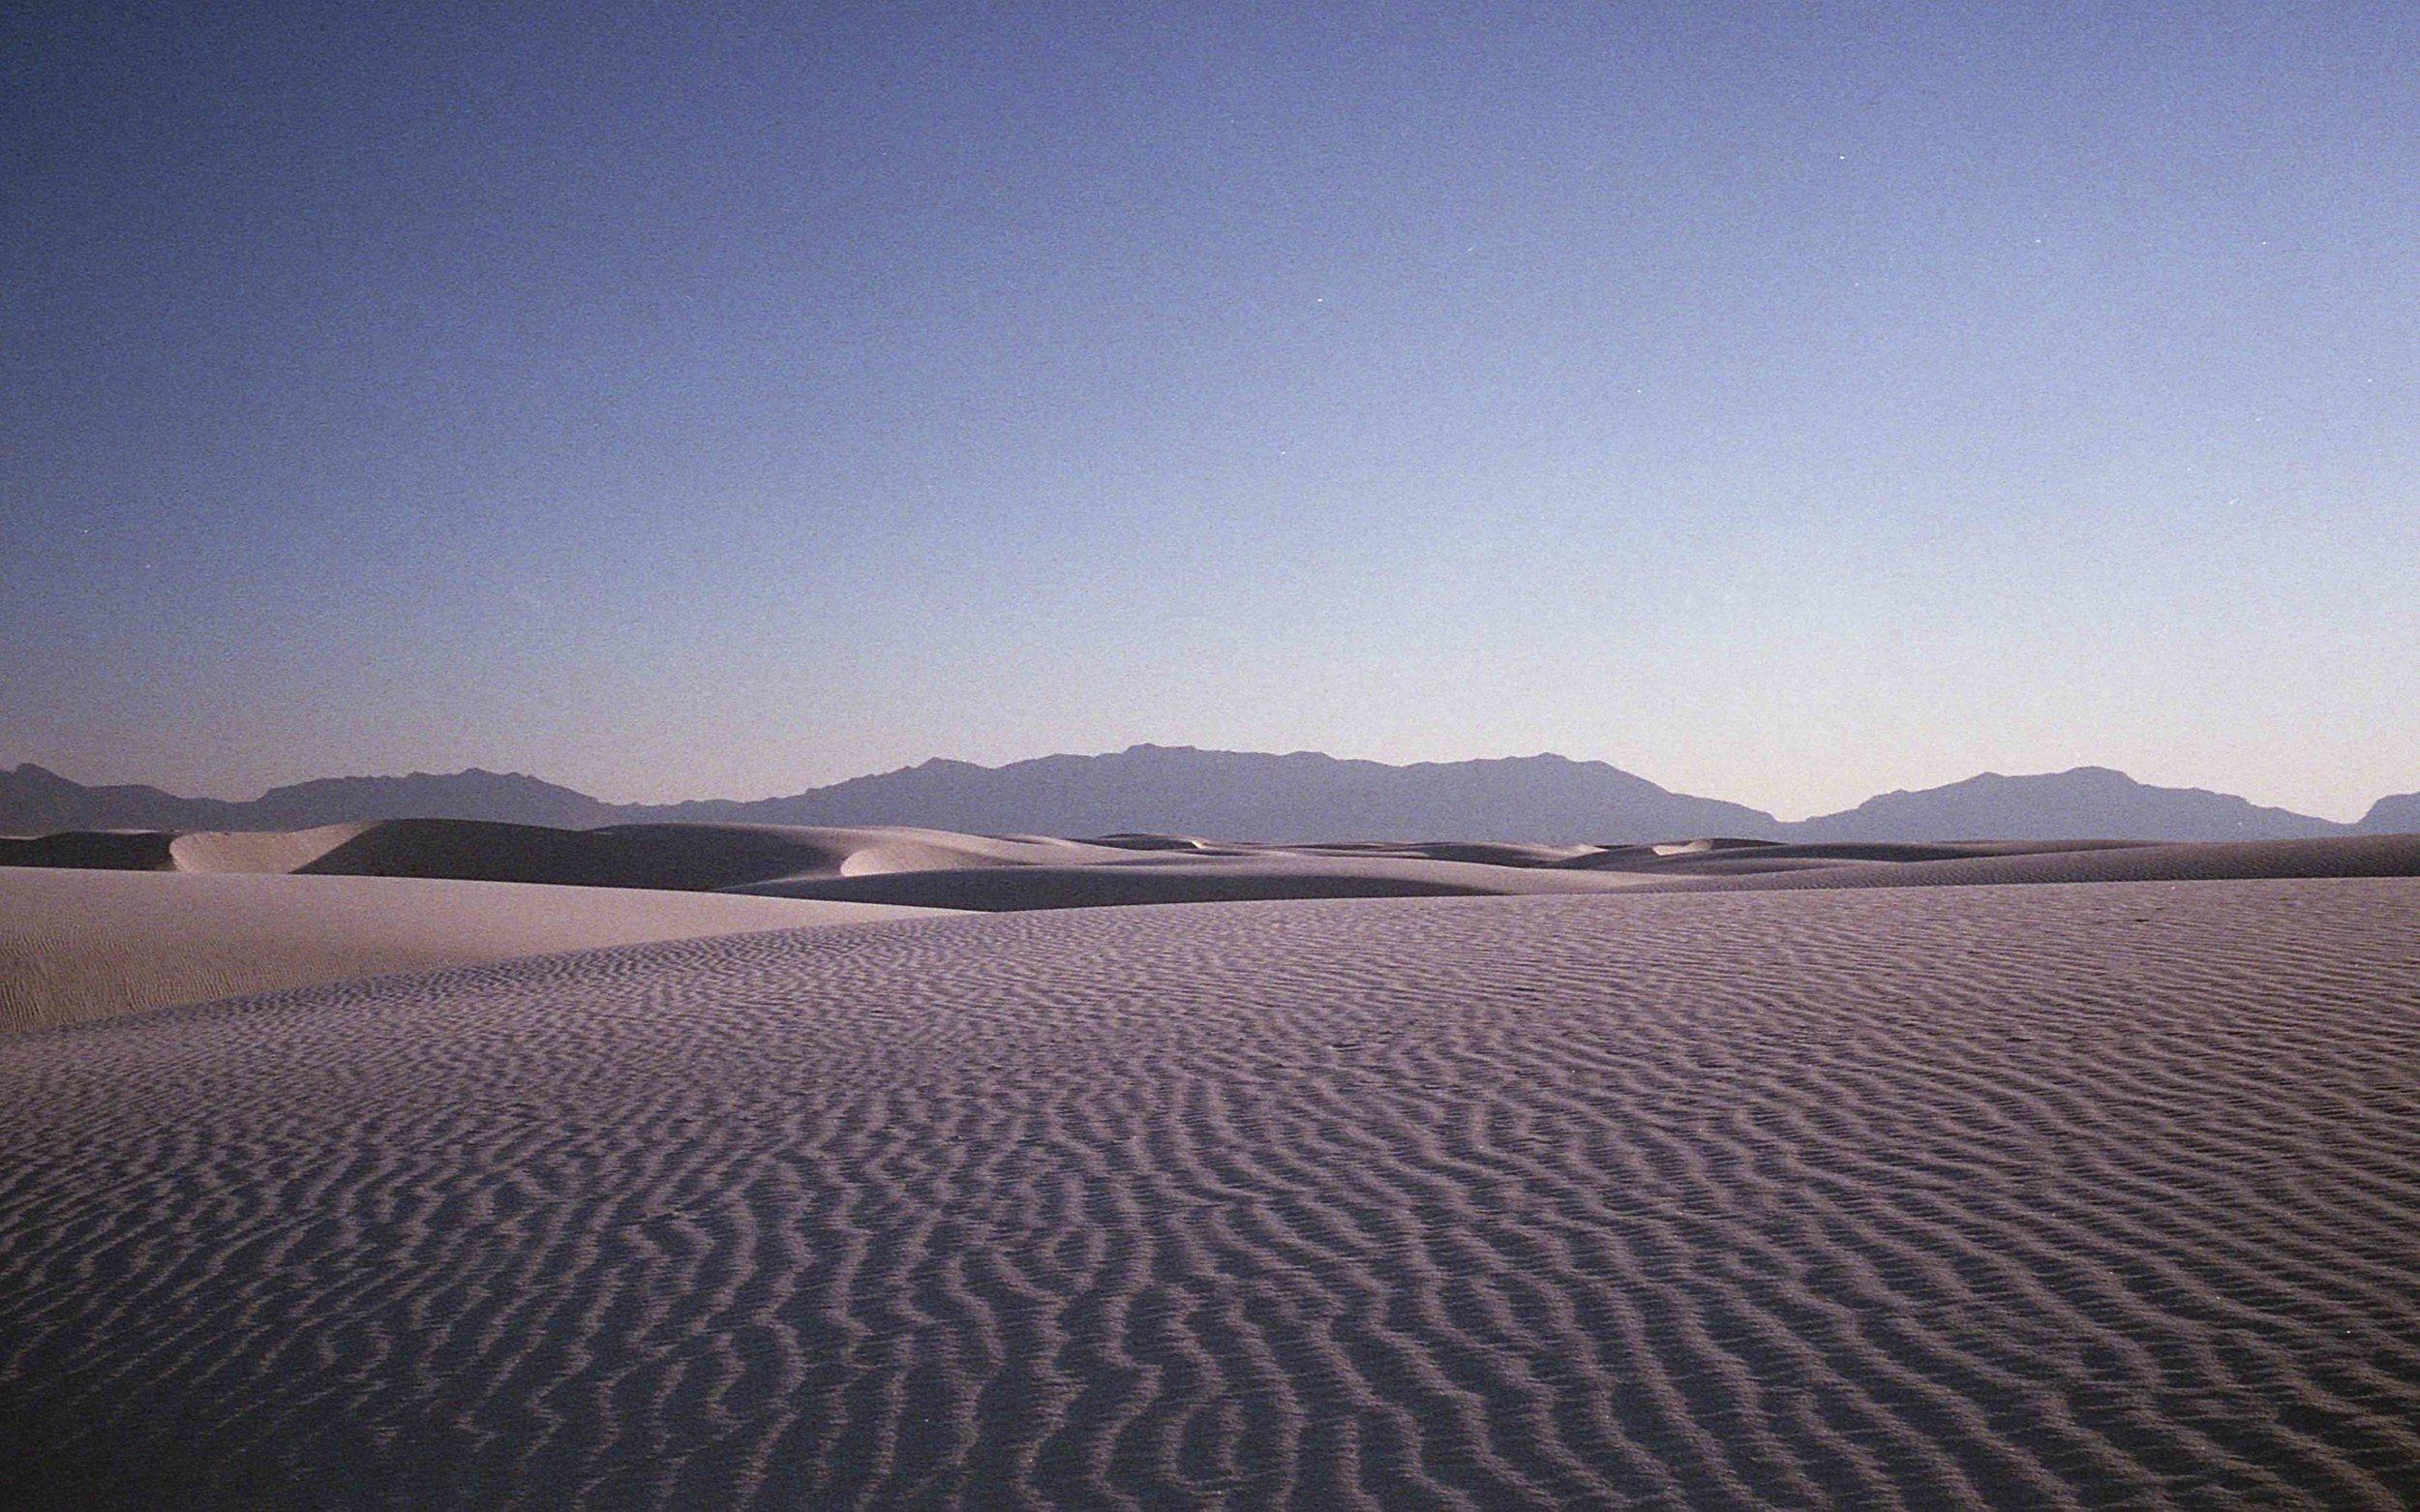 Desert053.jpeg